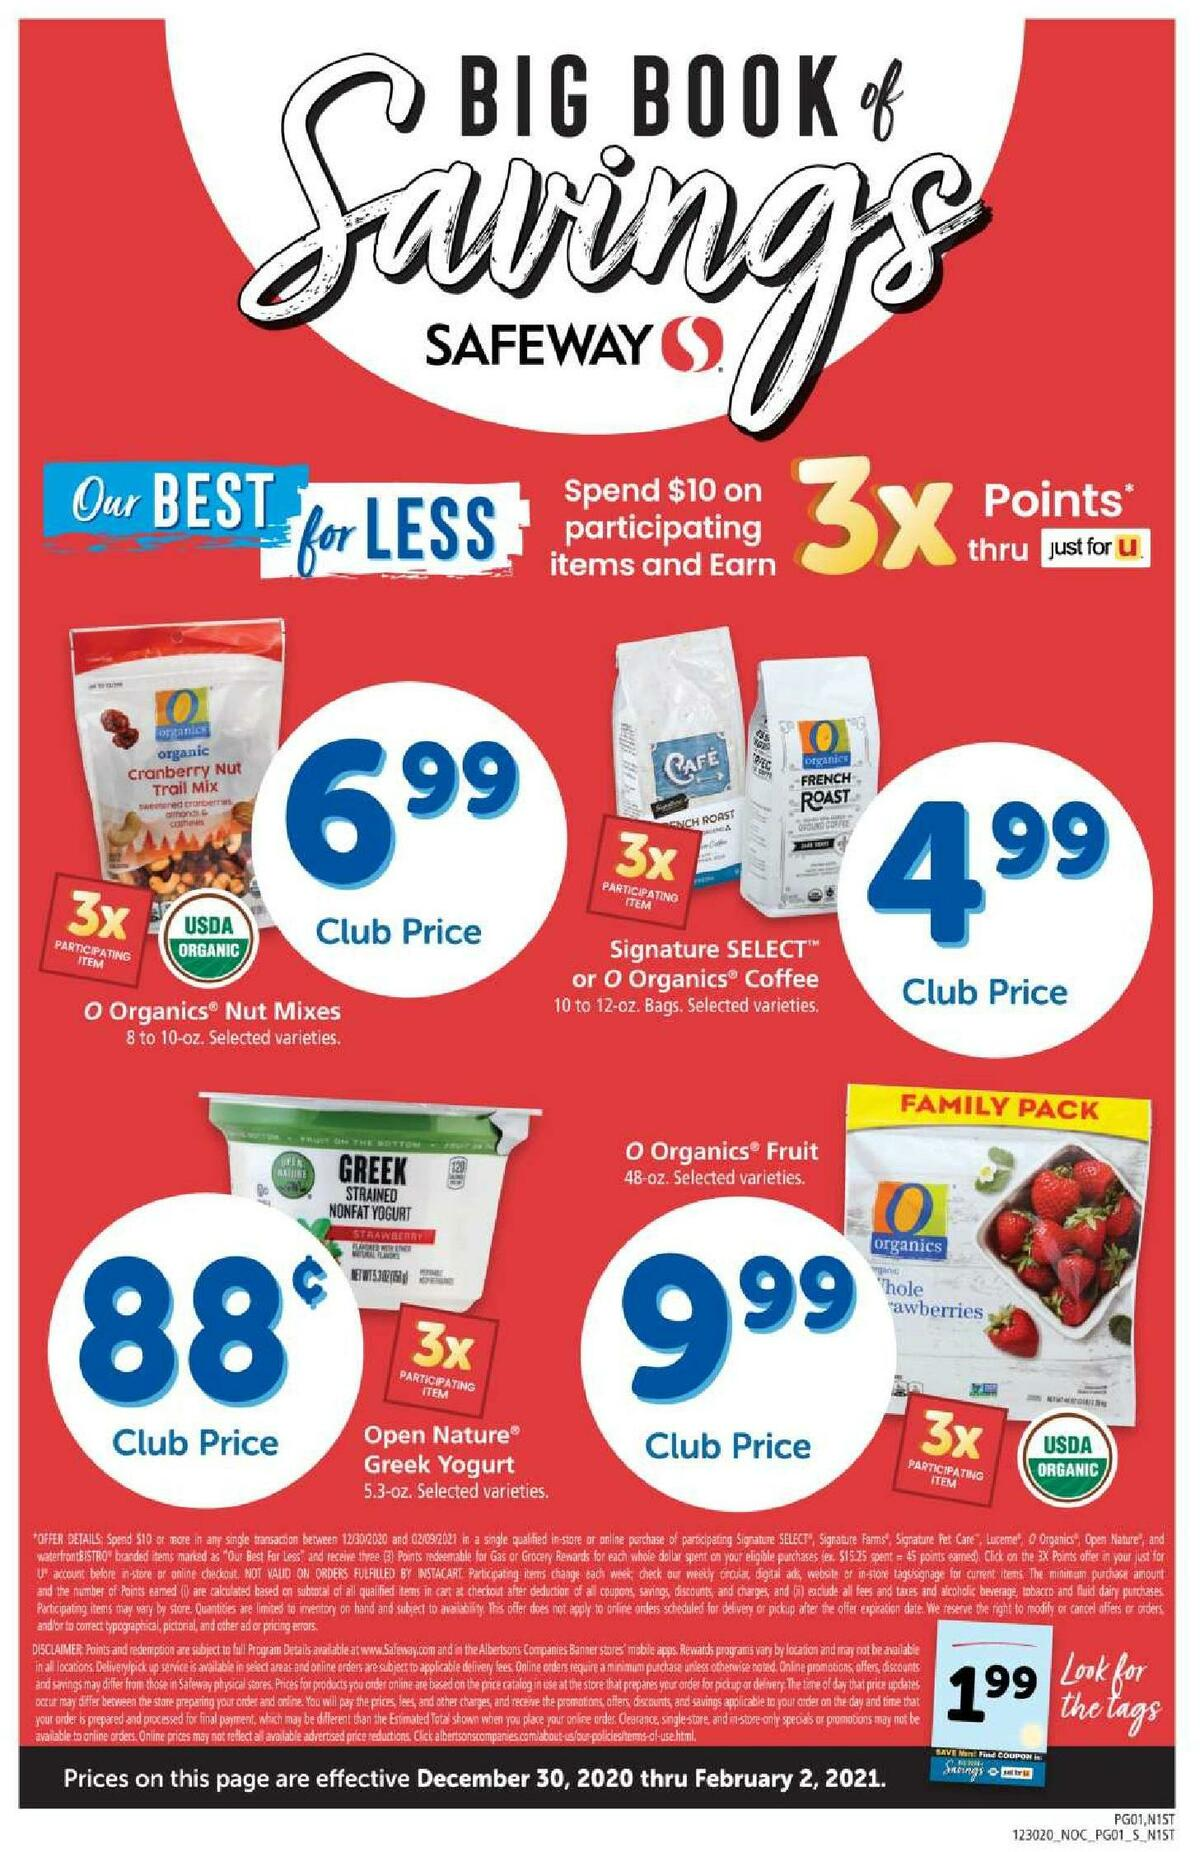 Safeway Big Book of Savings Weekly Ad from December 30